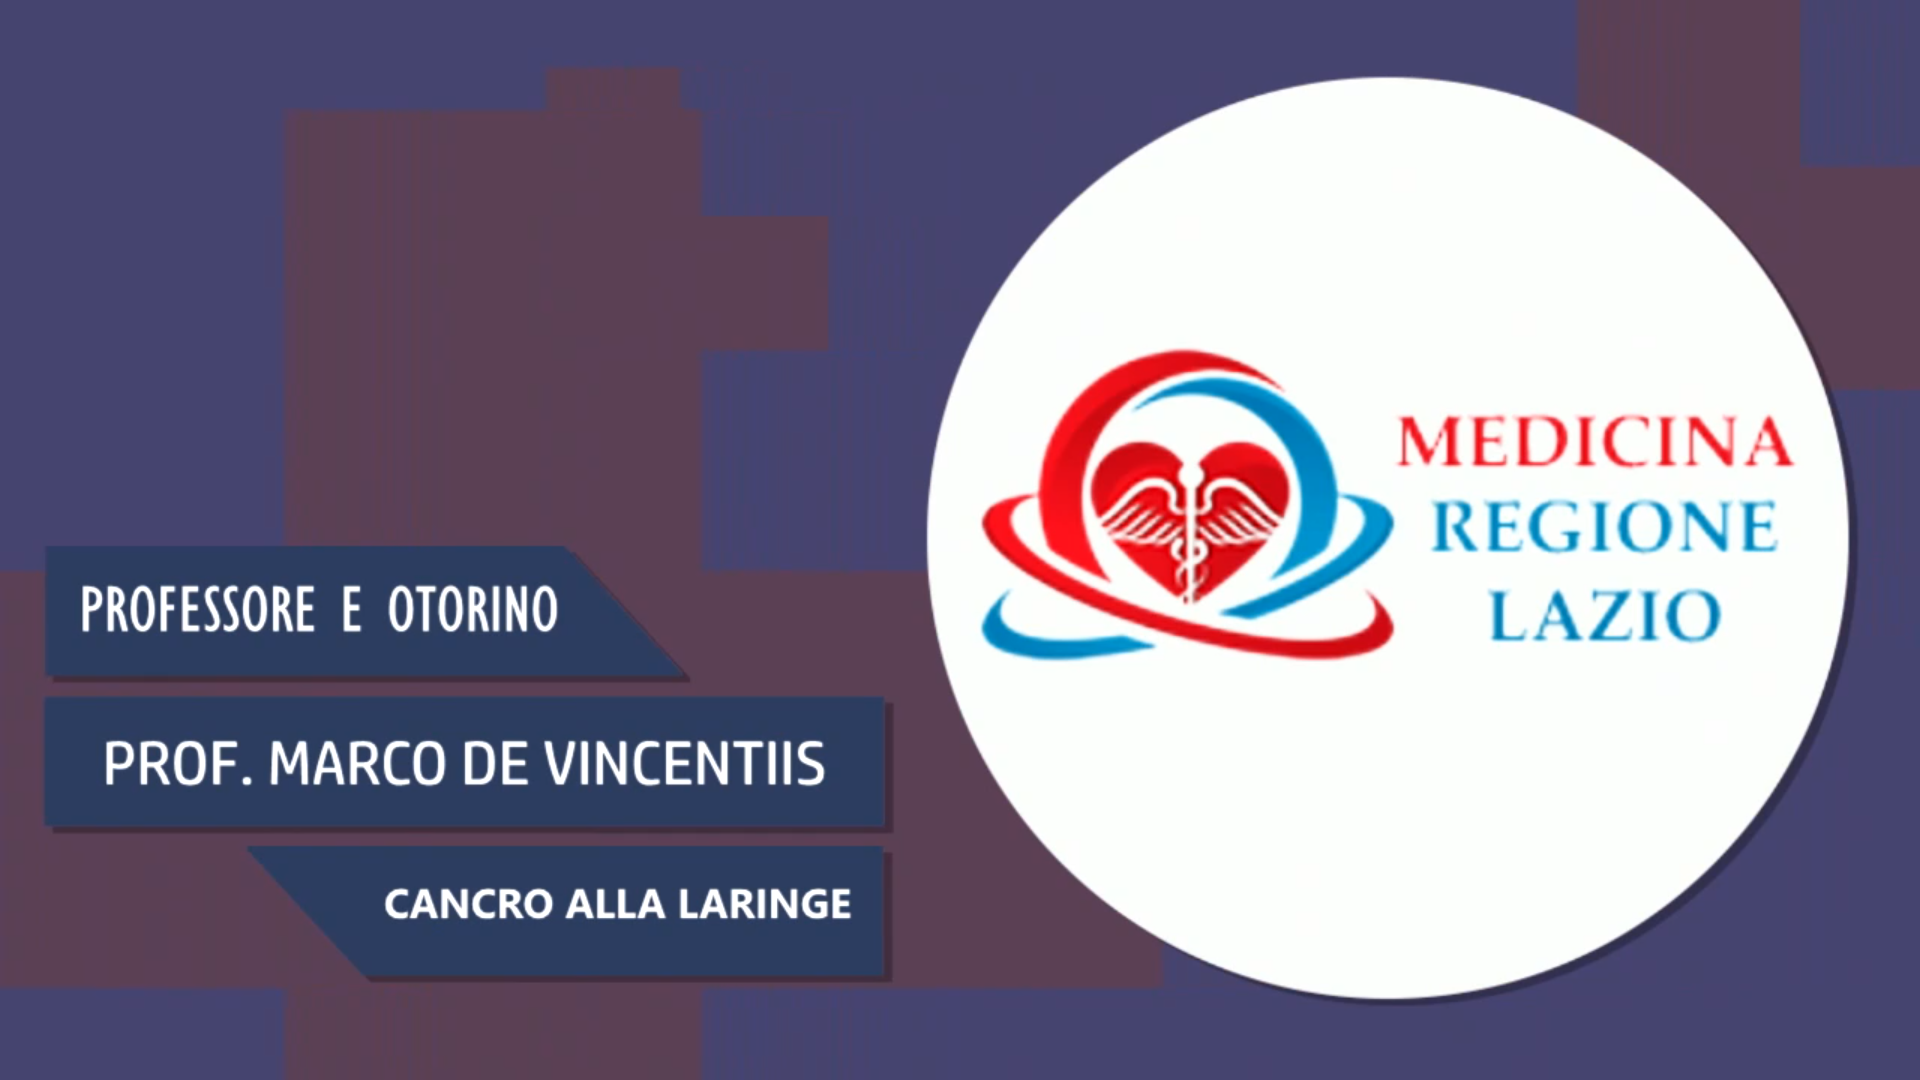 Intervista al Prof. Marco De Vincentiis – Cancro alla laringe